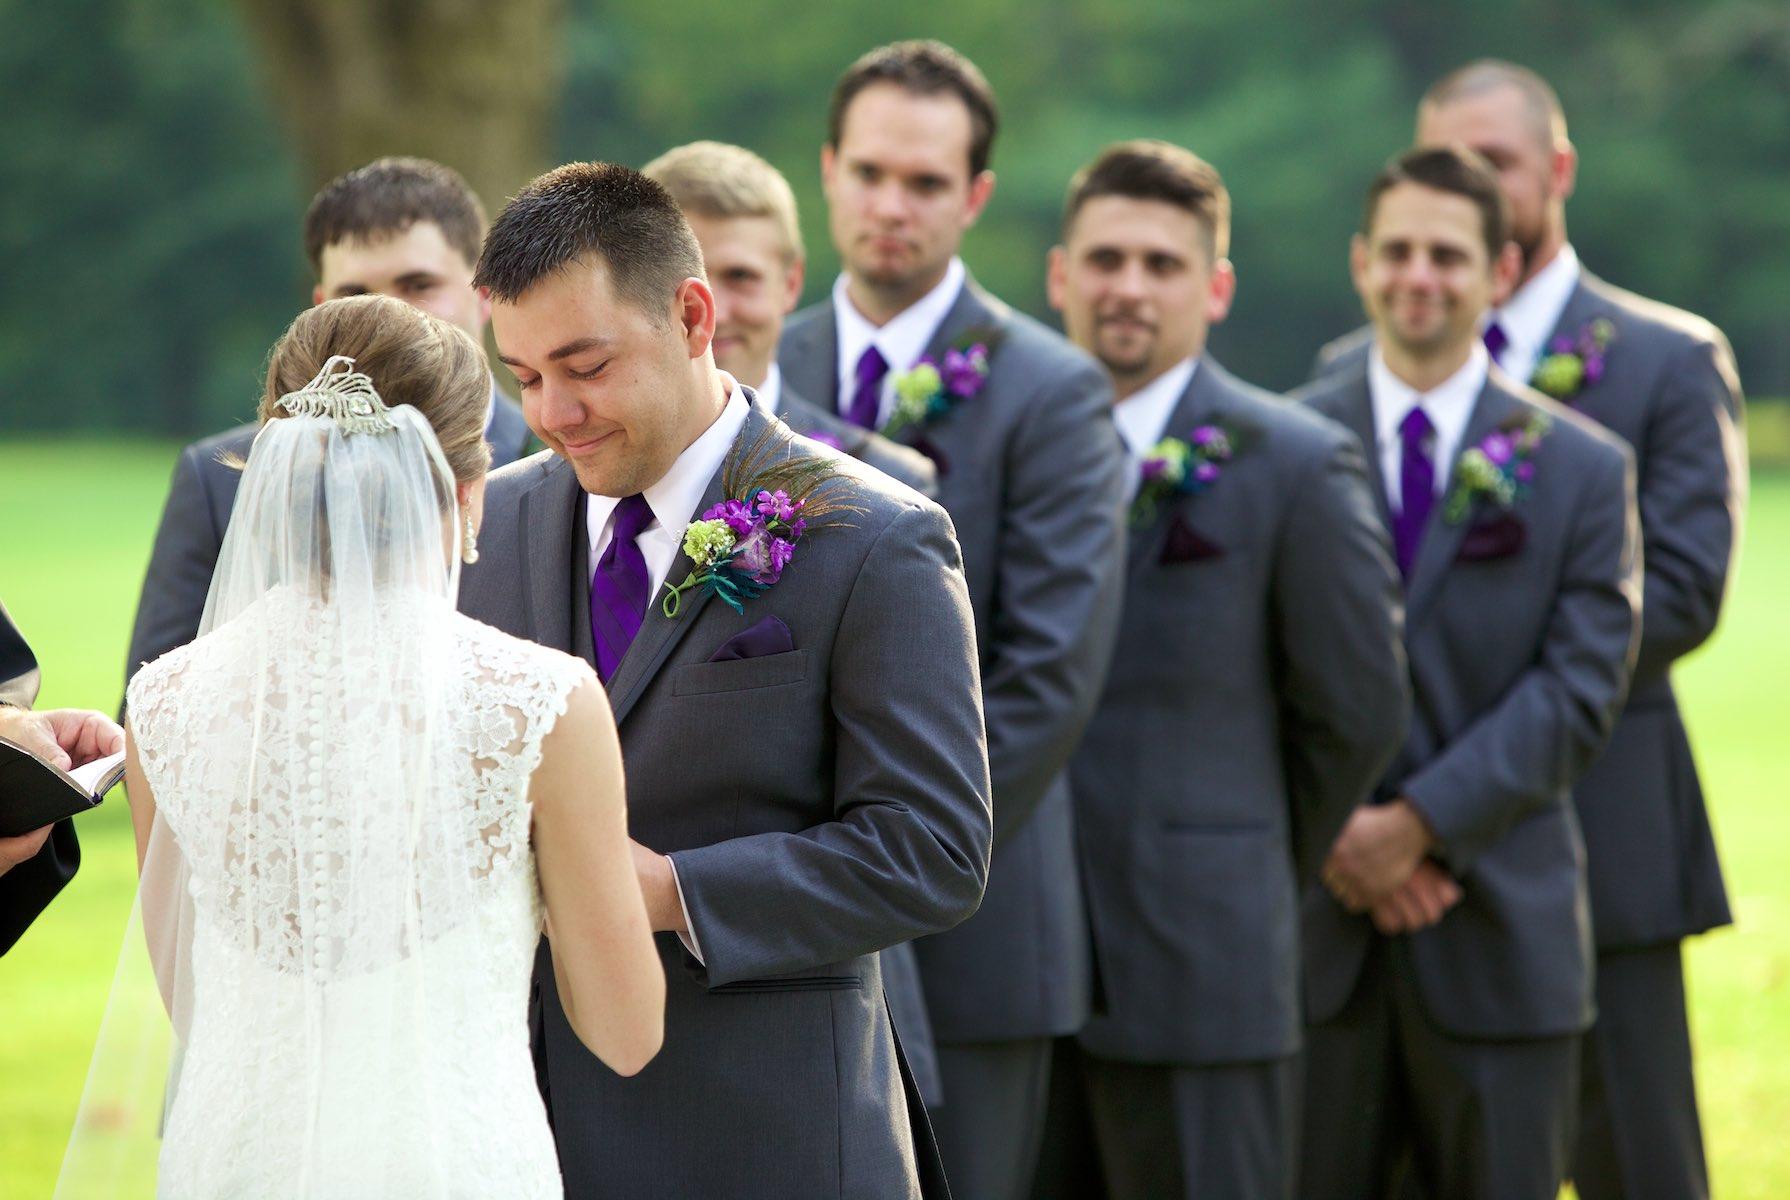 Amanda & Nick exchange rings, wedding ceremony at the Jacksonville Illinois Country Club. Wedding photography by Steve & Tiffany Warmowski.